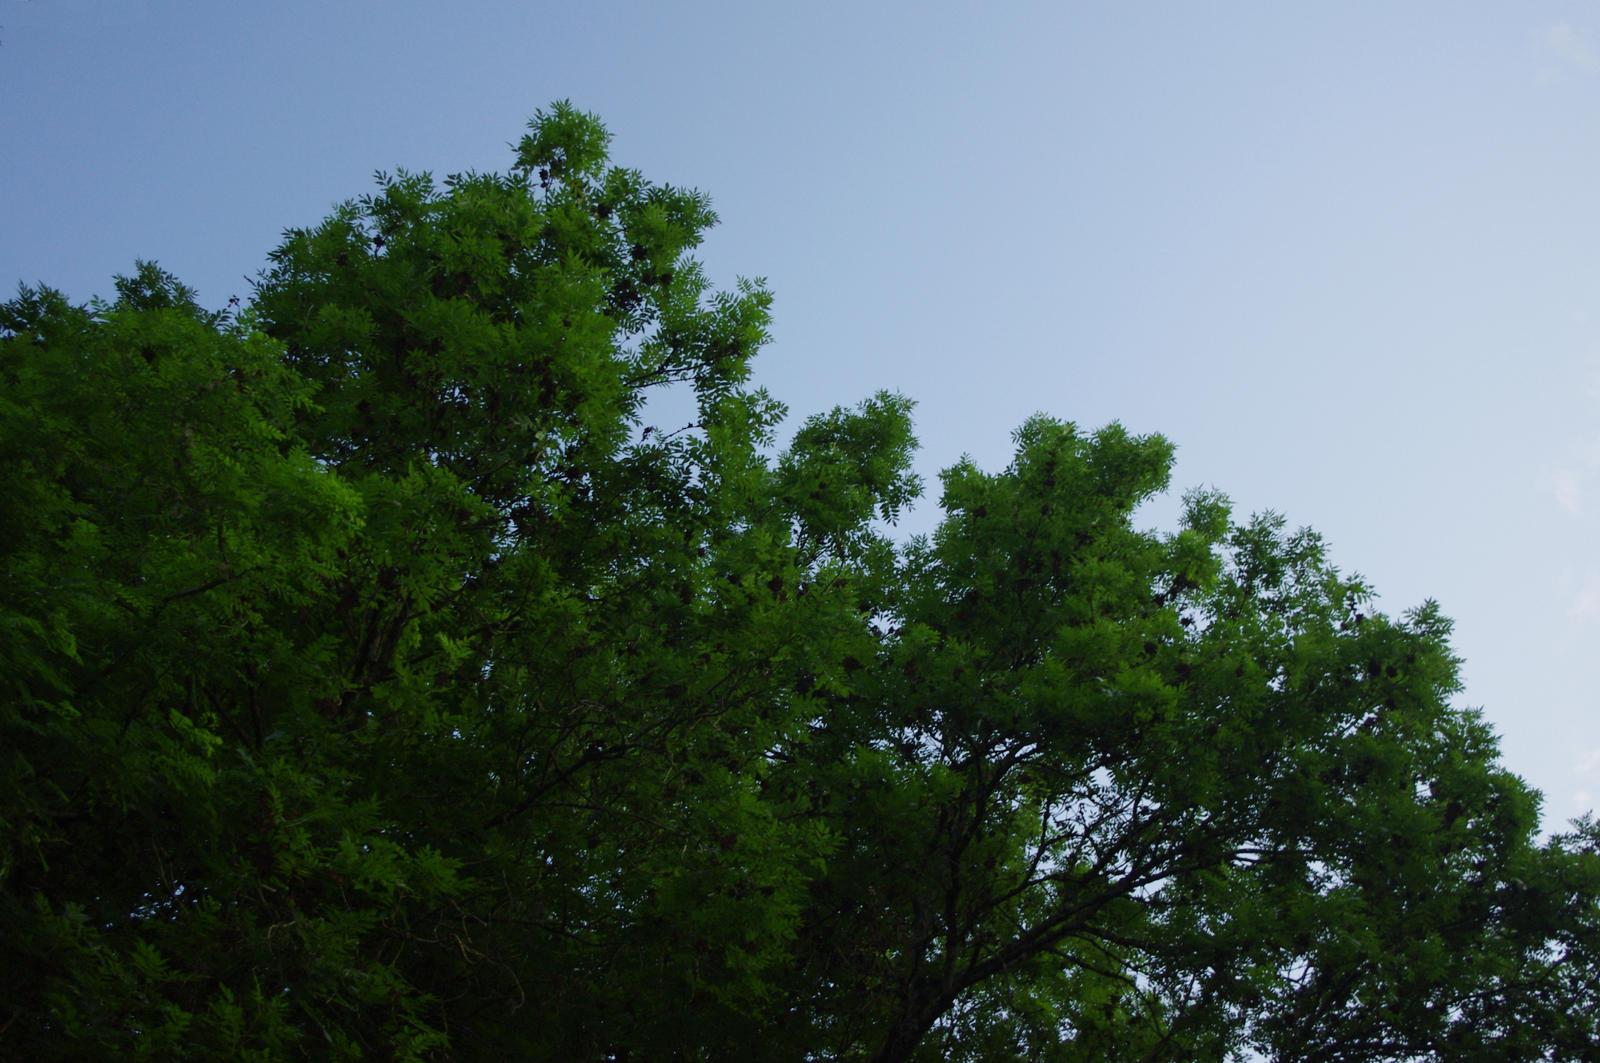 Green forever by Arayashikinoshaka